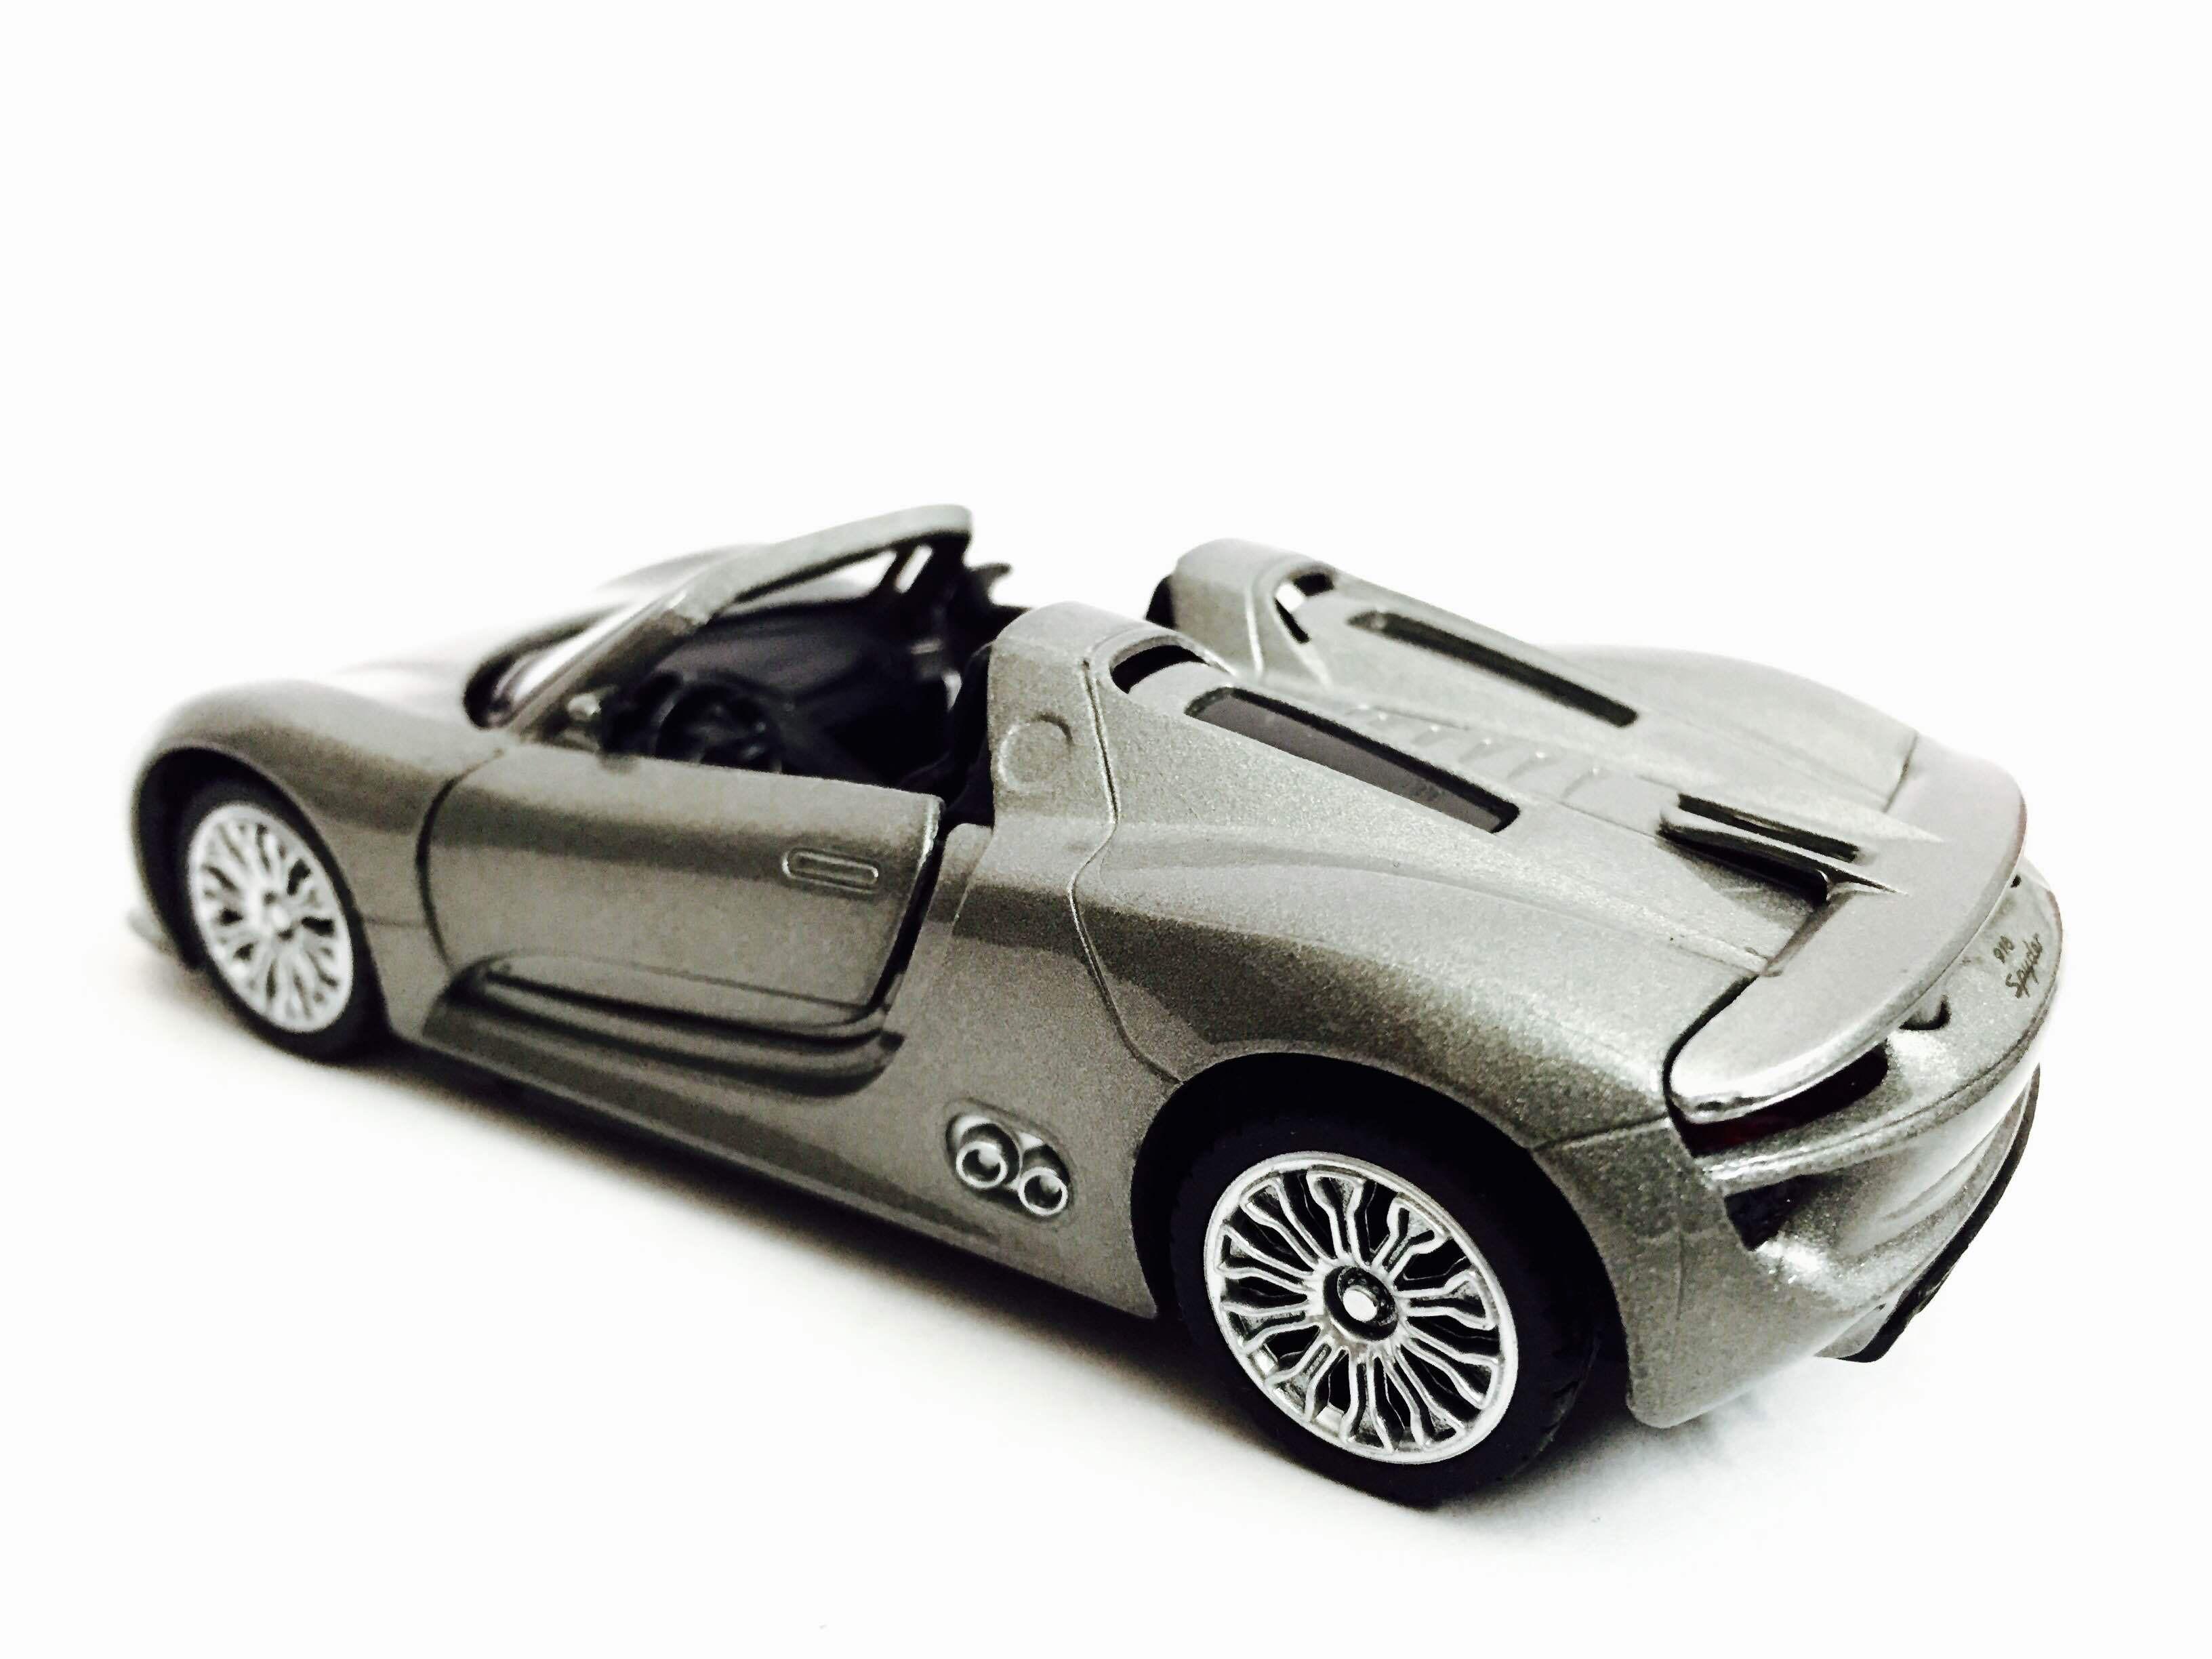 innovador-porsche-918-spyder-1-38-original-imaejfwesqz5svug Fascinating Porsche 918 Spyder Fiyat Listesi Cars Trend